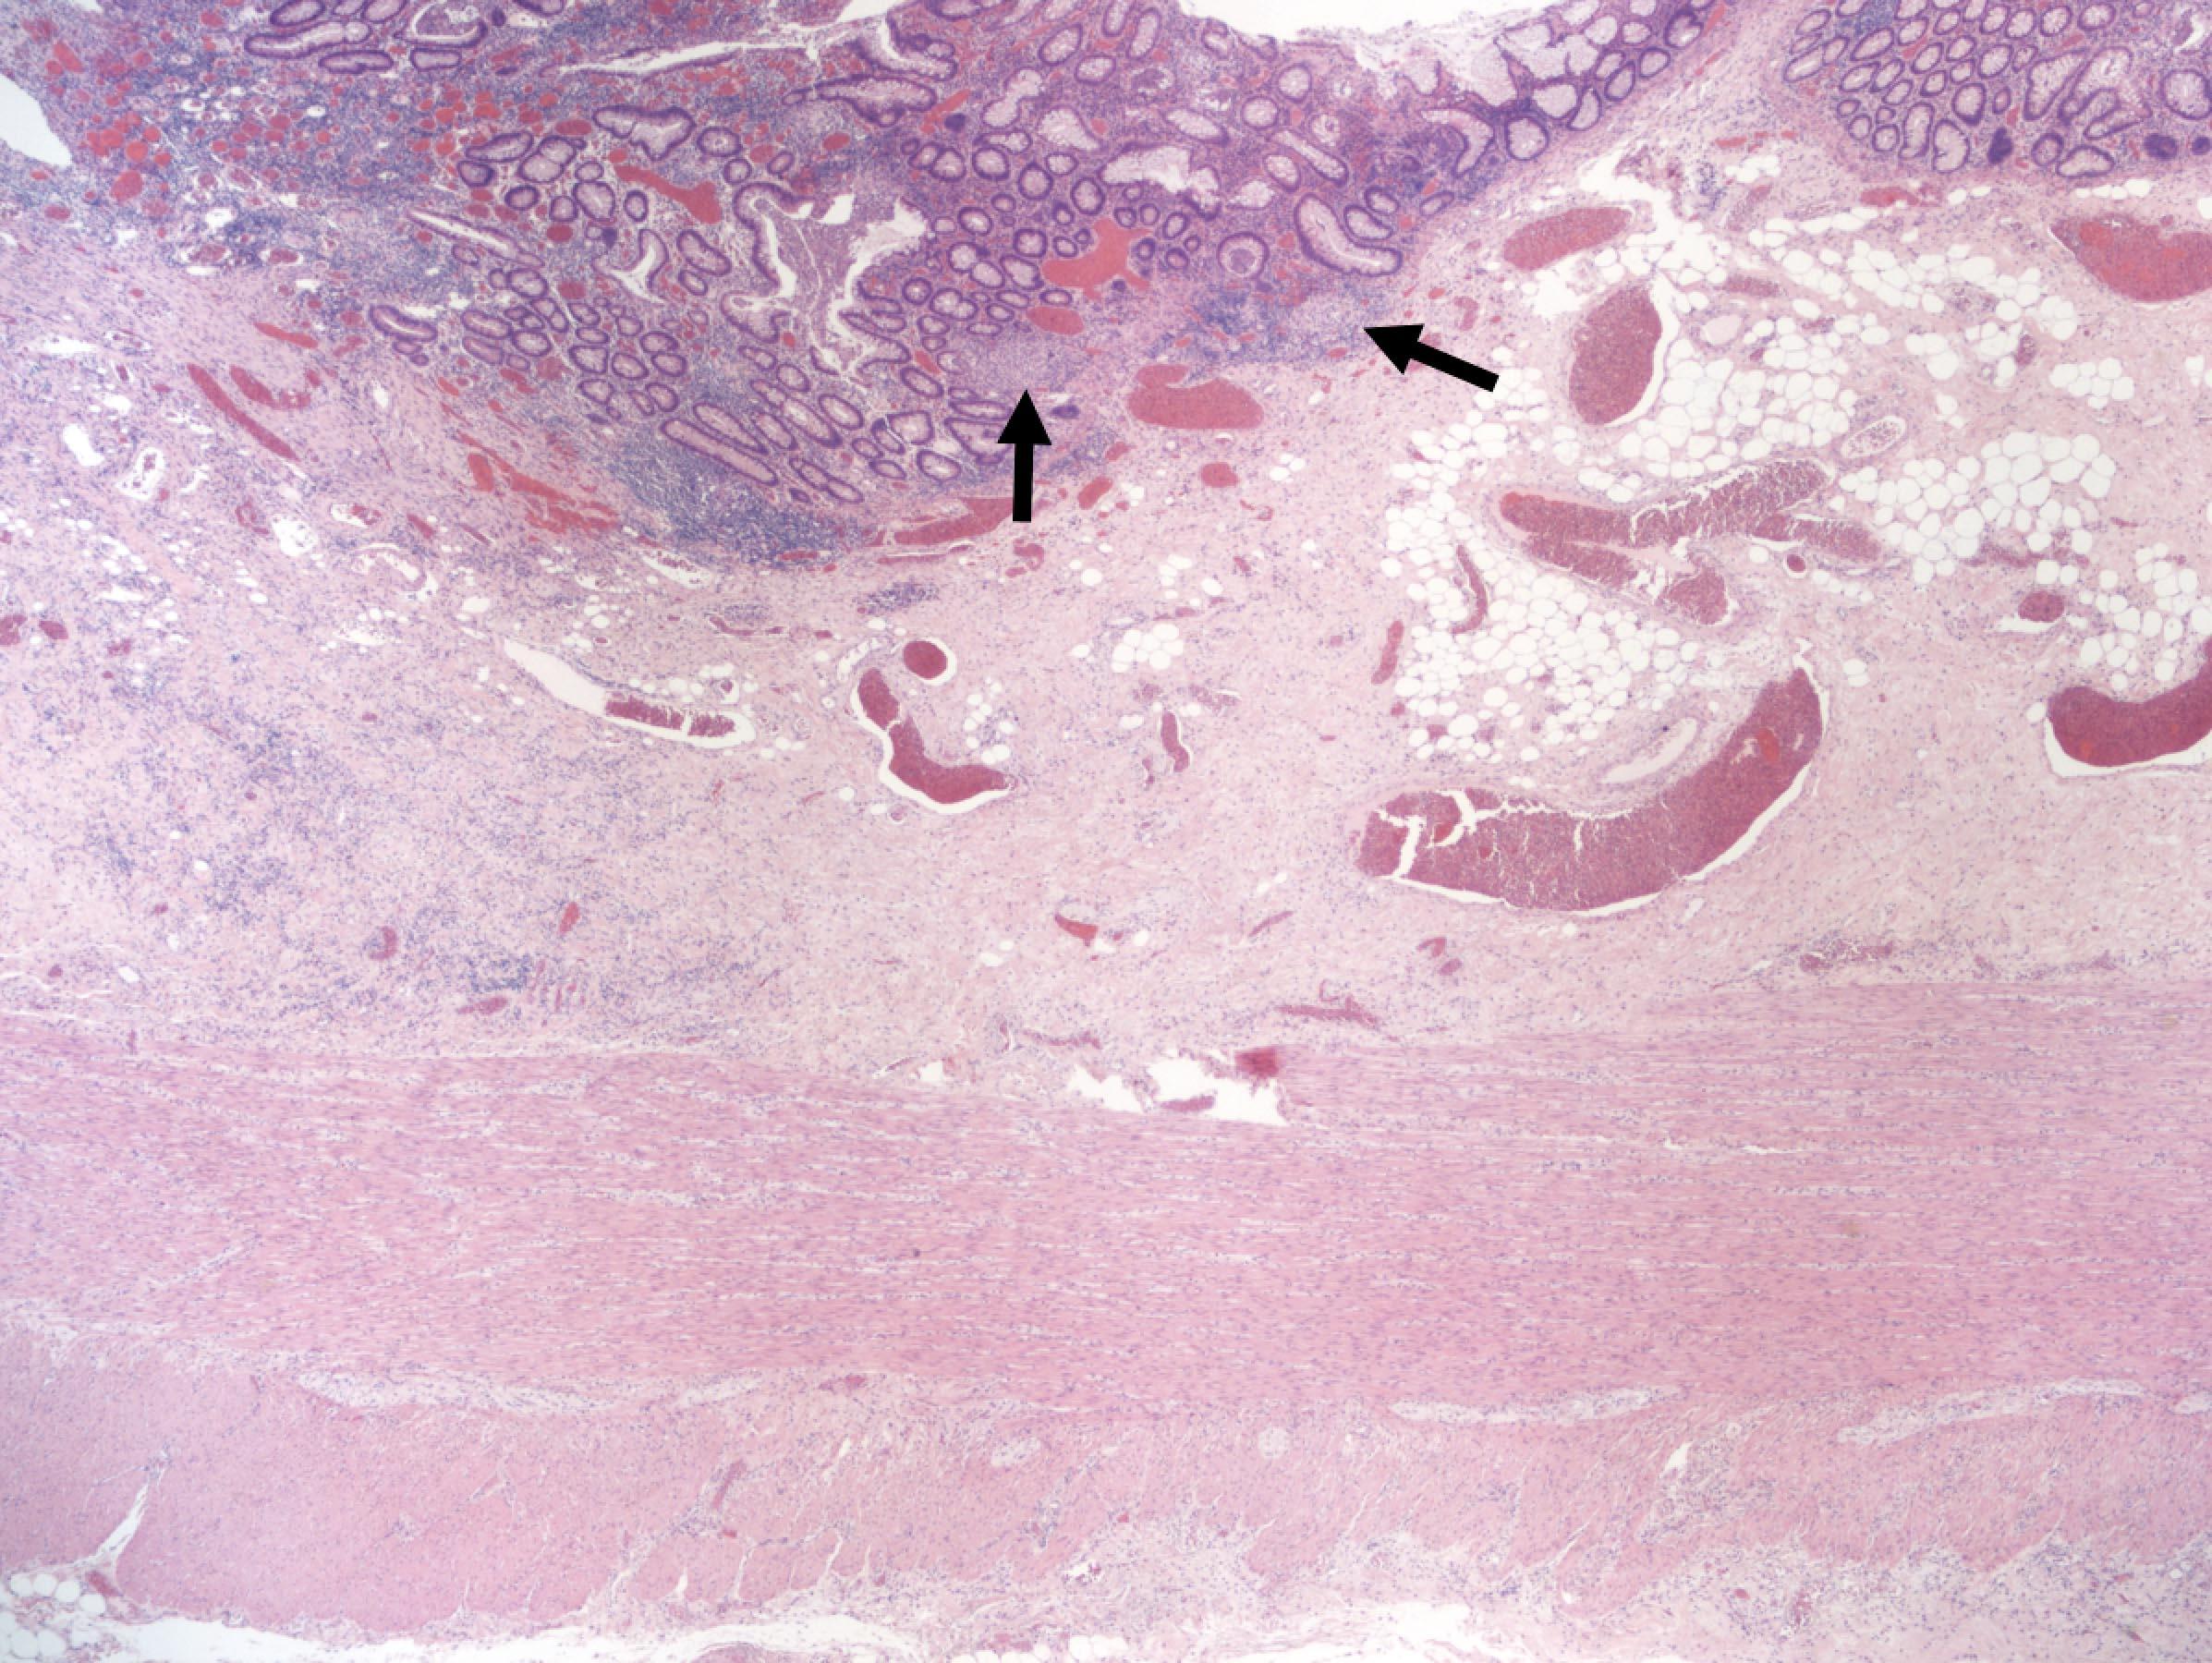 Superficial (ulcerative colitis-like) Crohn's disease